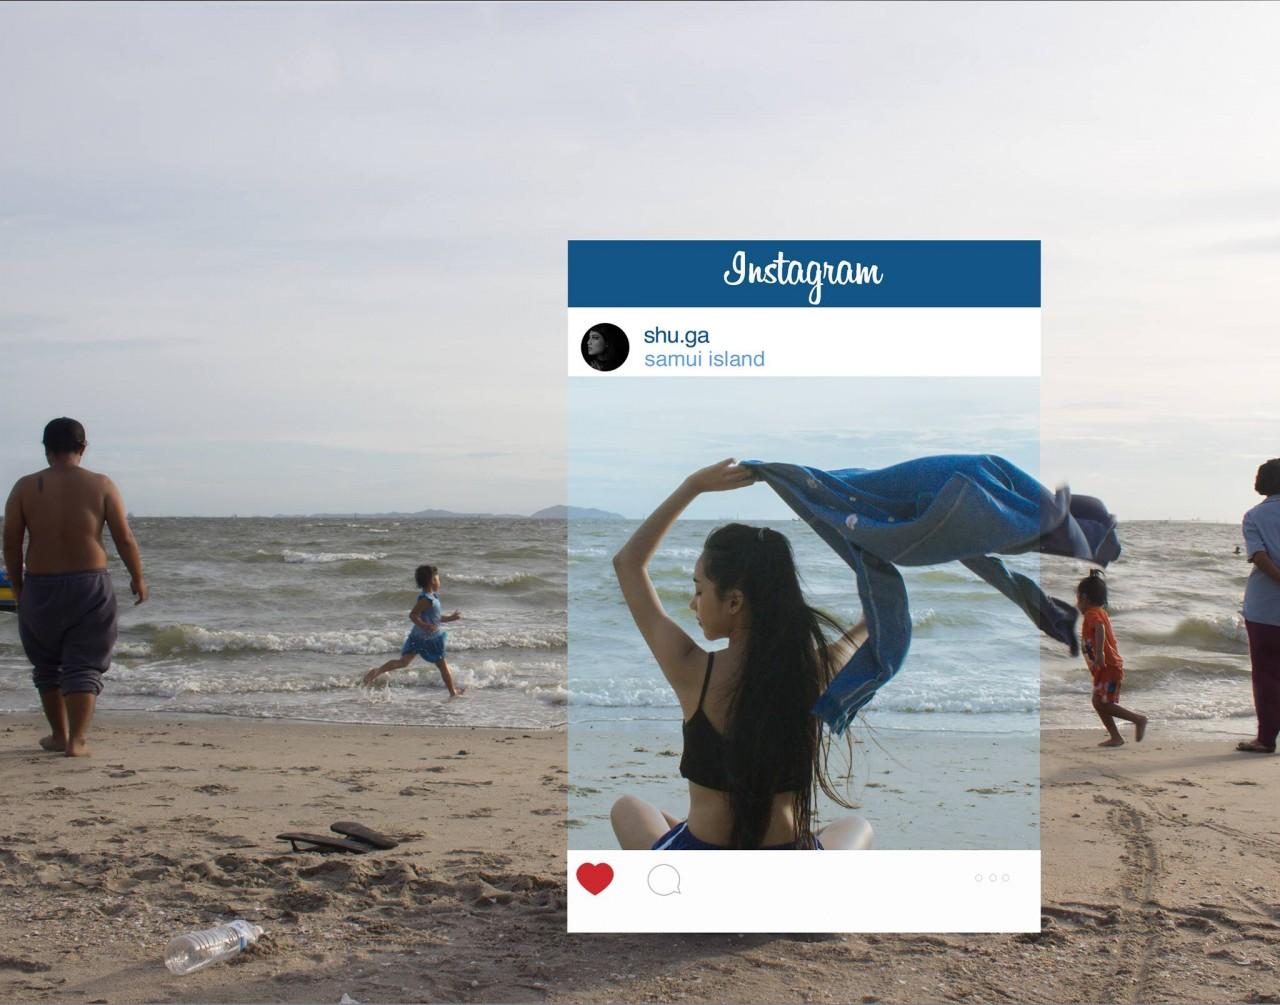 instagram-hros-cadre-06-1280x1005